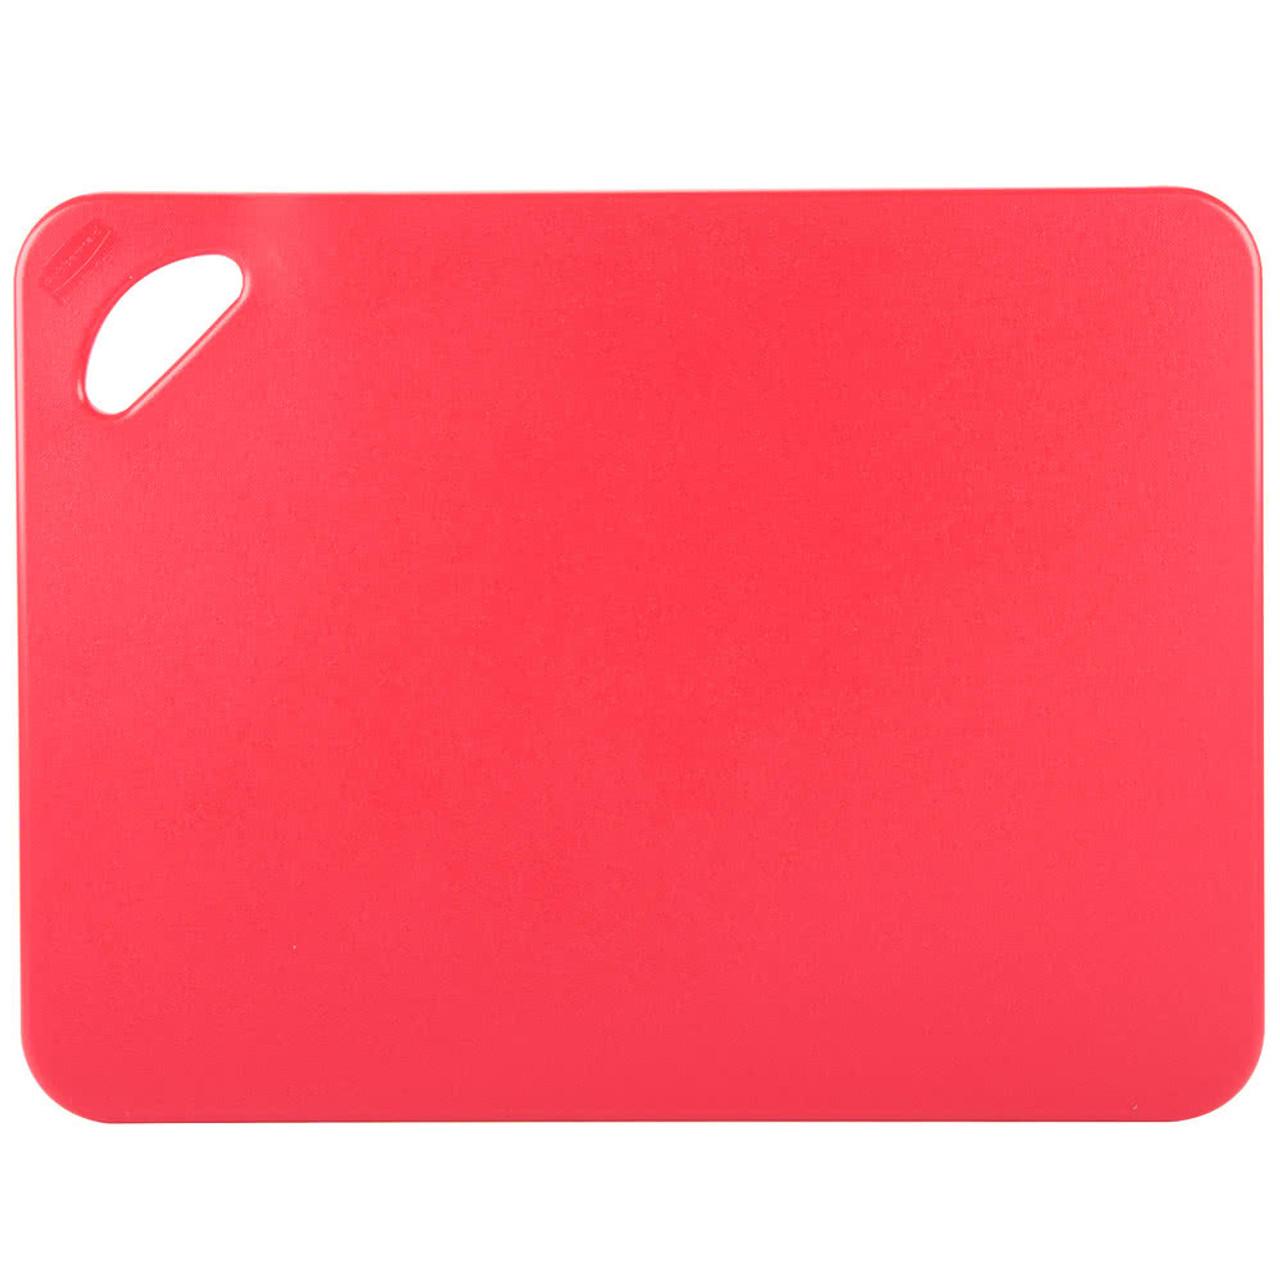 Rubbermaid Cutting Board Red - 1980408